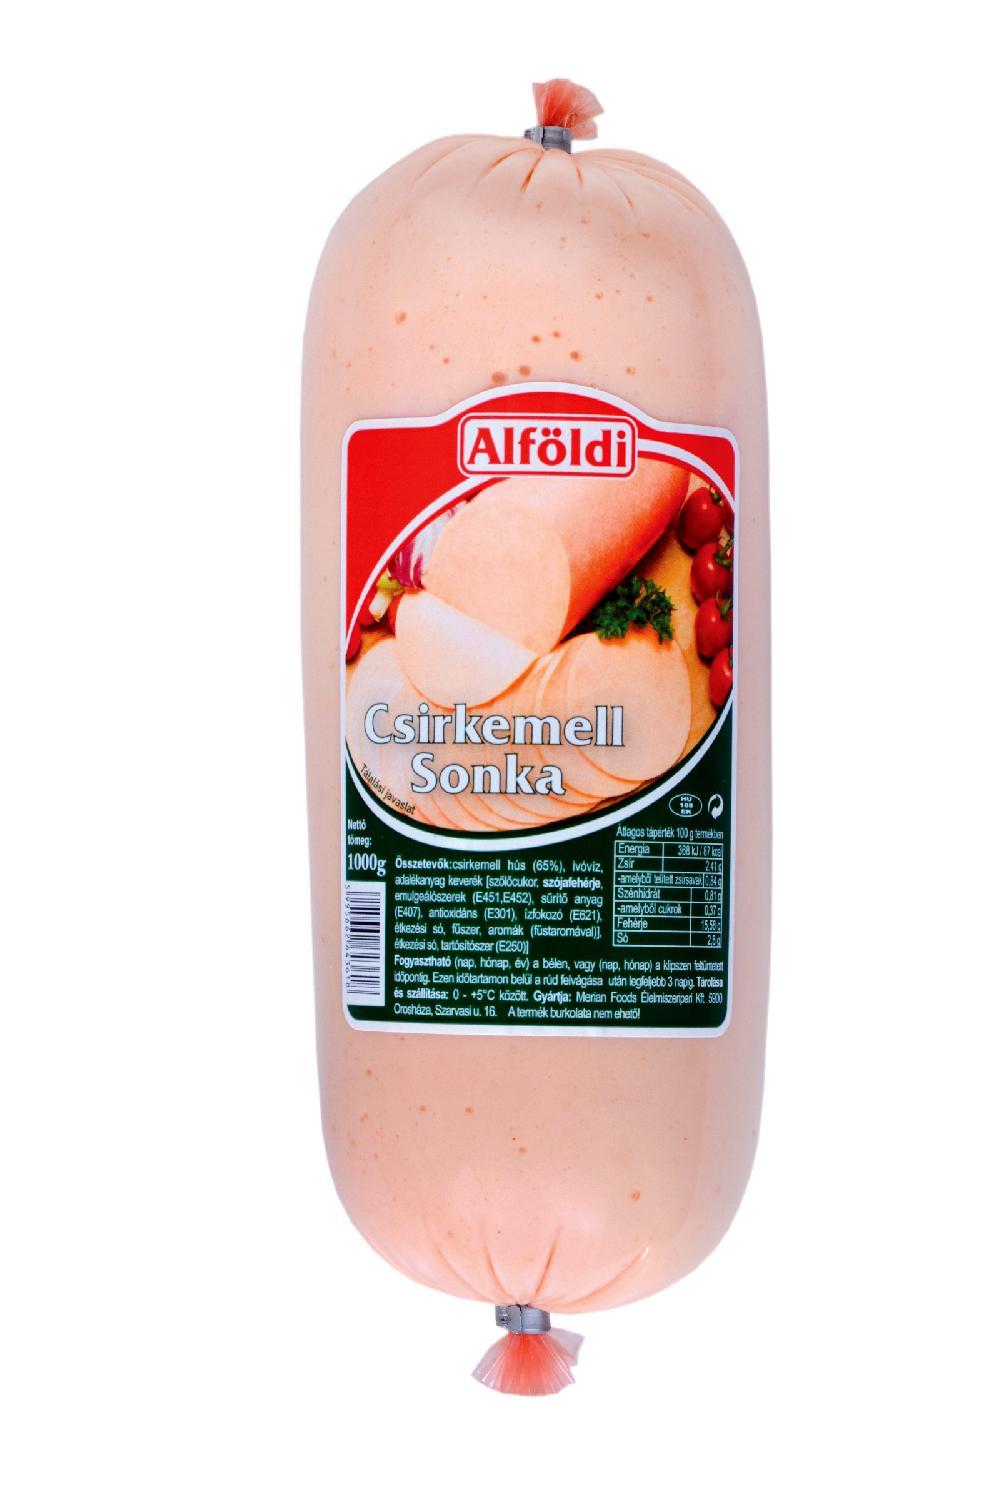 Csirkemell sonka 1kg ALFÖLDI Merián